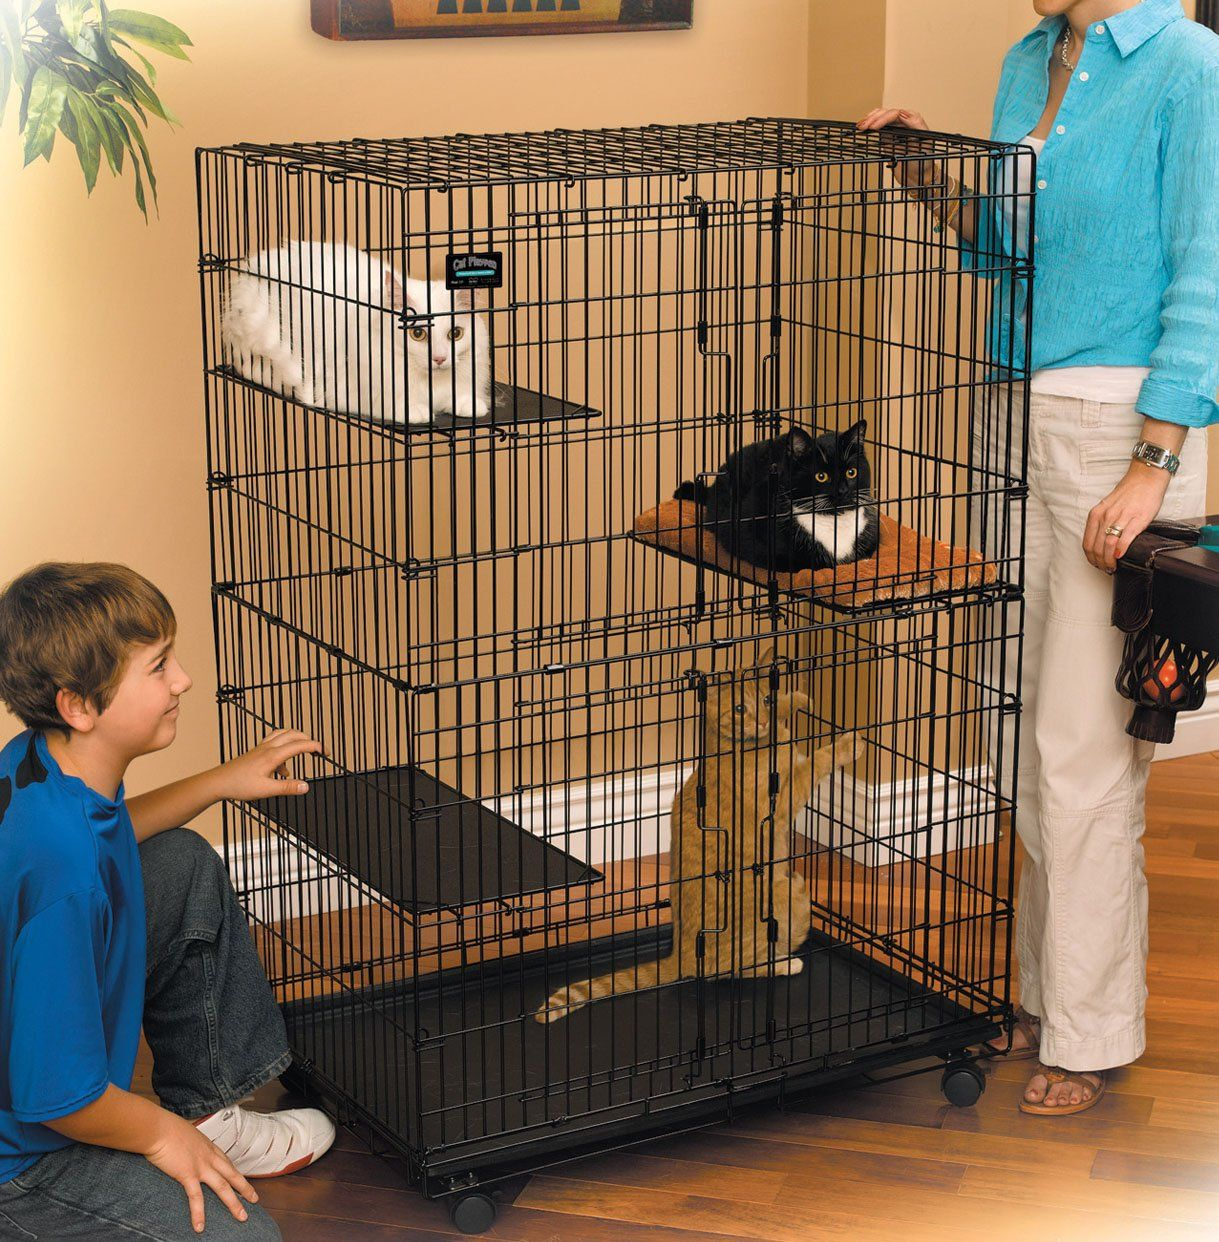 Cat Kitten Playpen Crate Cage Kennel Home Sanctuary Portable Foldable Steel  New   ShopMonkeez   1